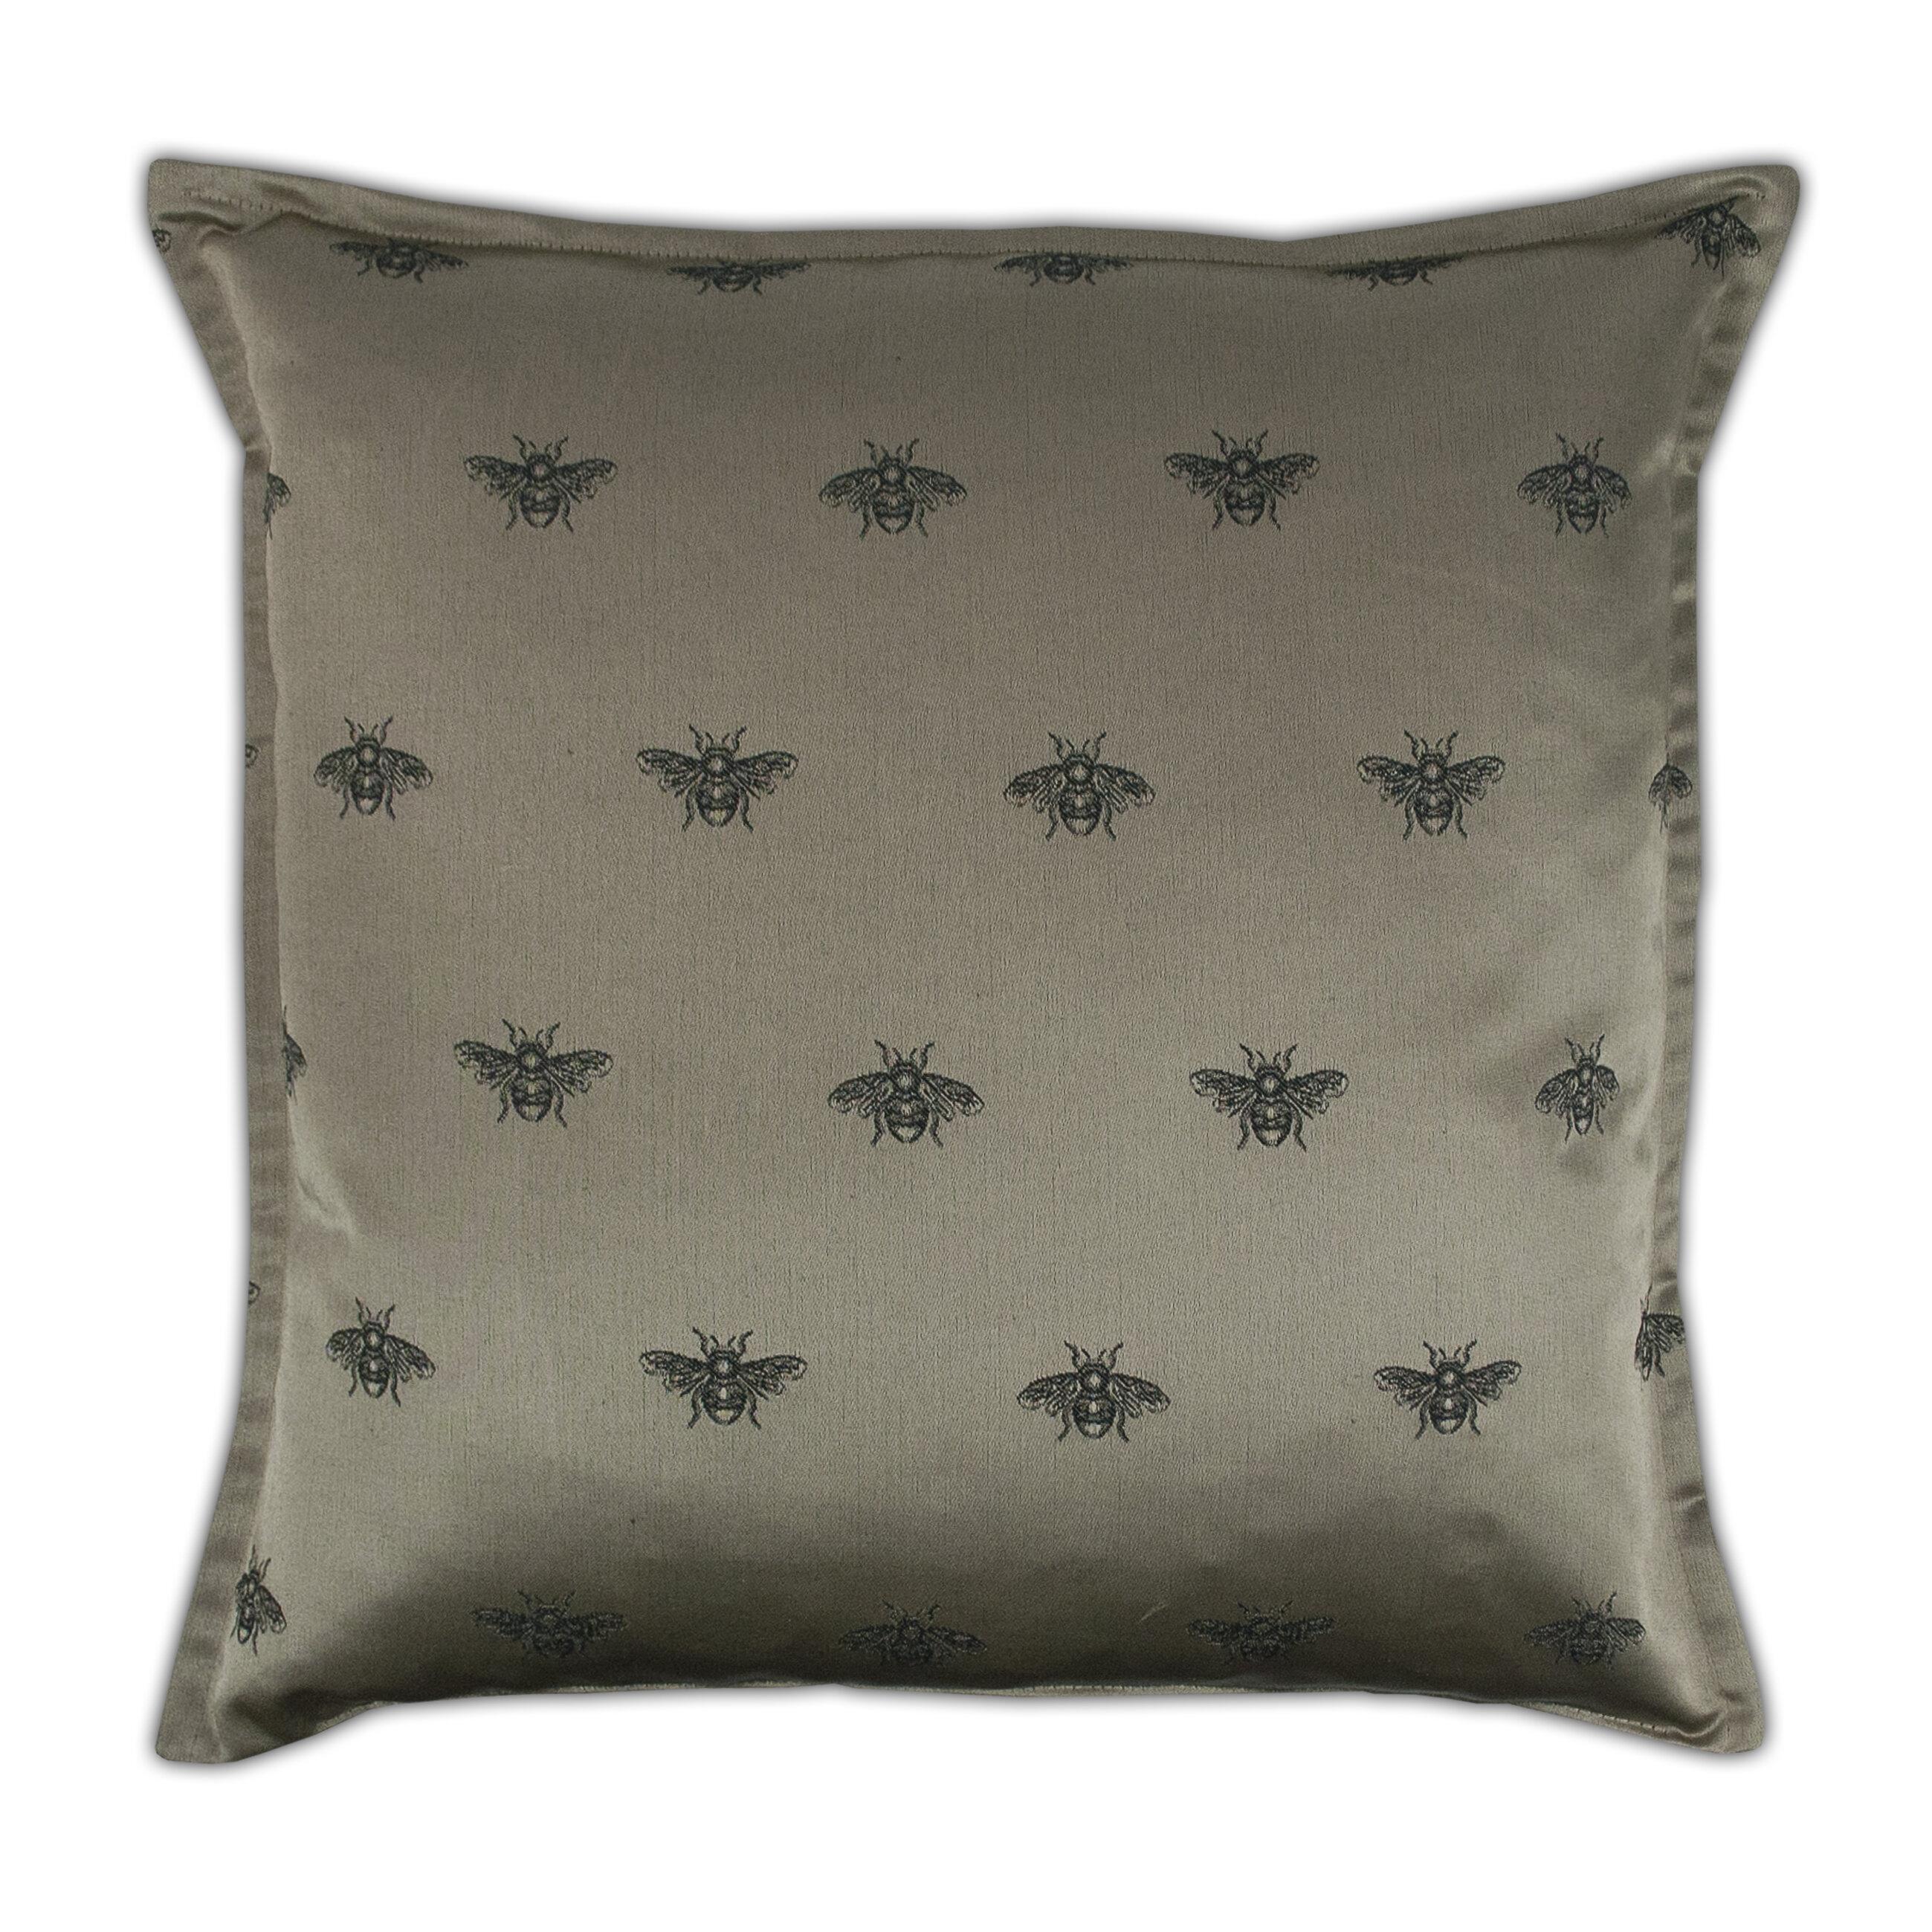 Sherry Kline Knoxville Decorative Throw Pillow Wayfair